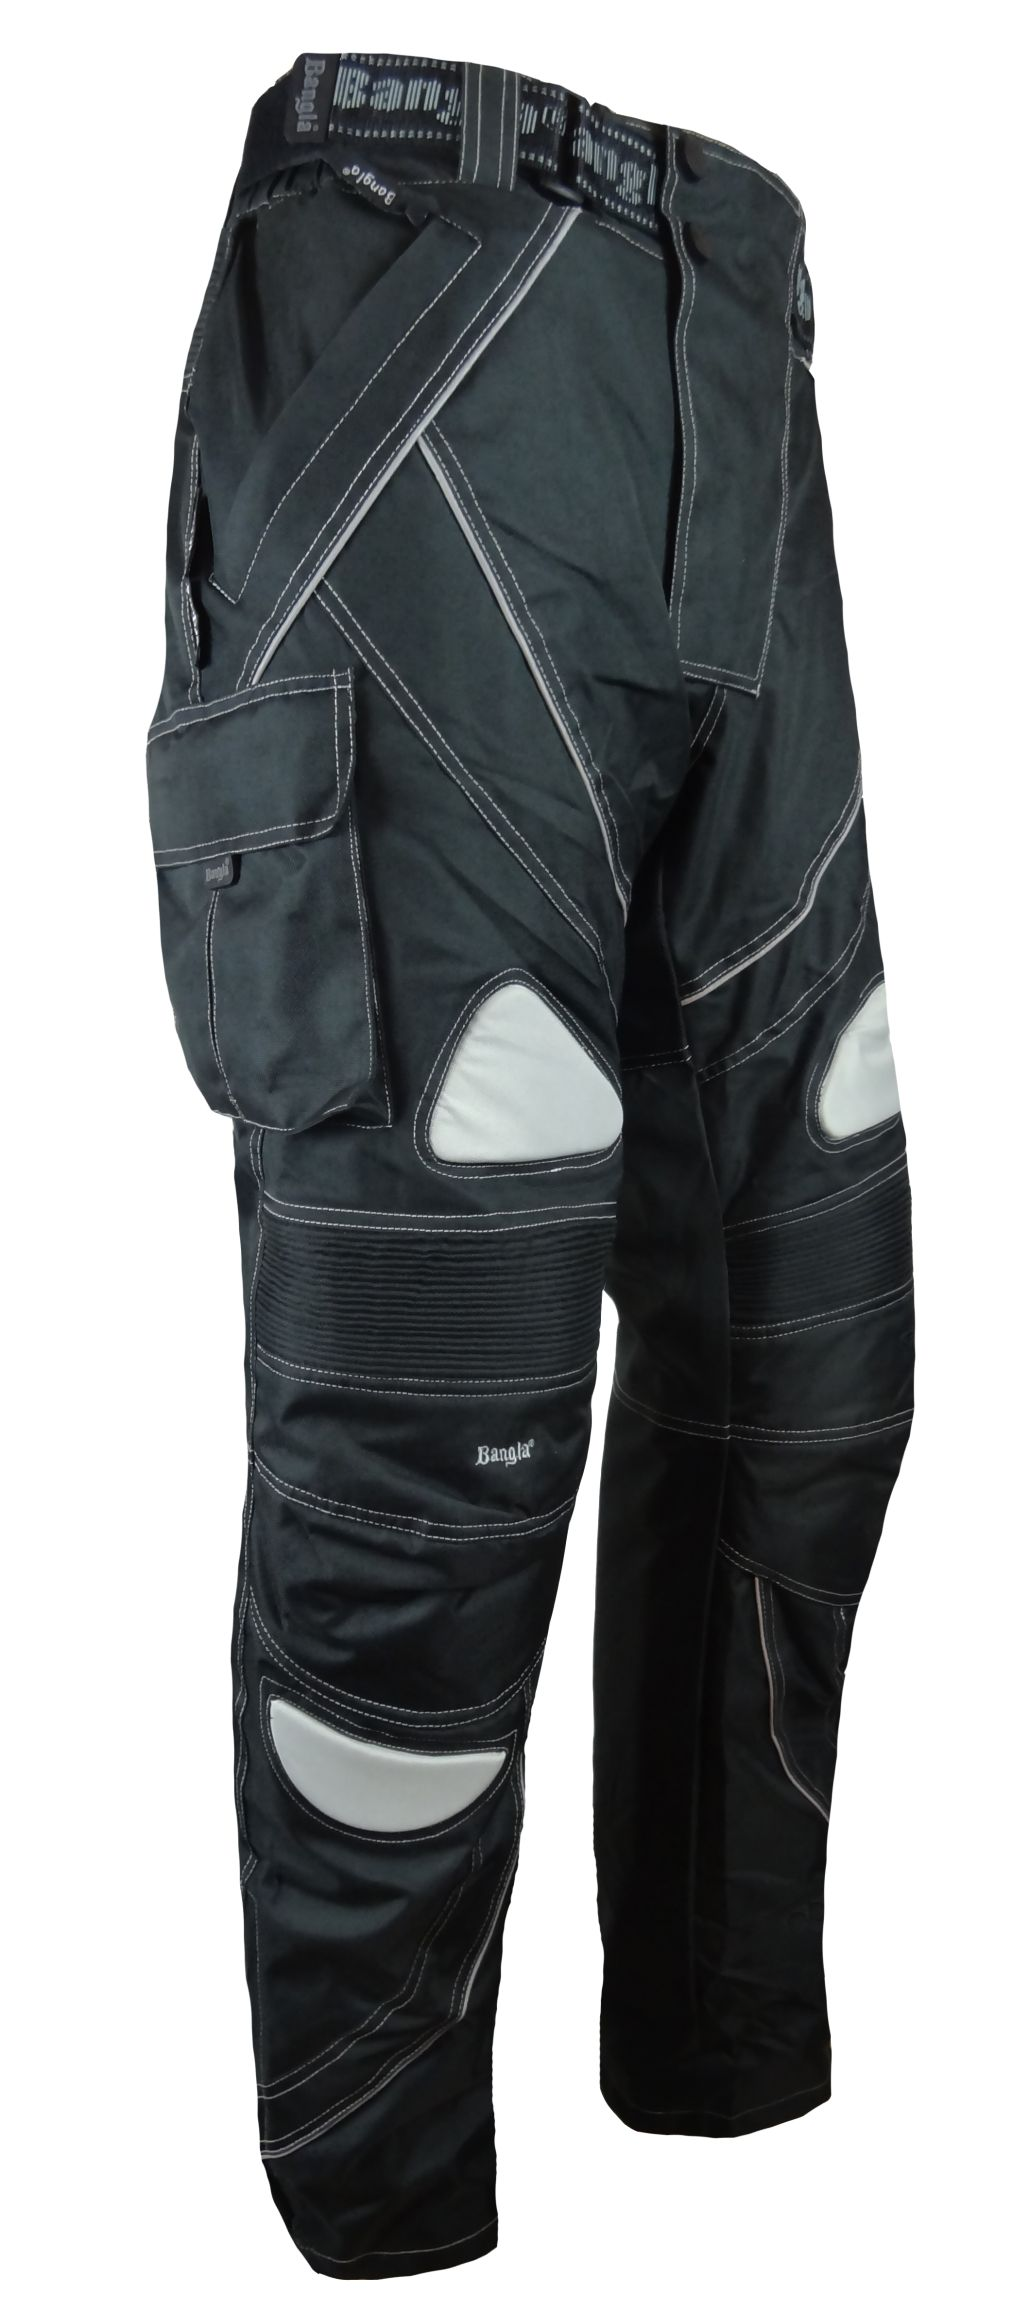 Bangla Winter Motorradhose Cordura Schwarz mit Fleece Motorrad S - 6 XL